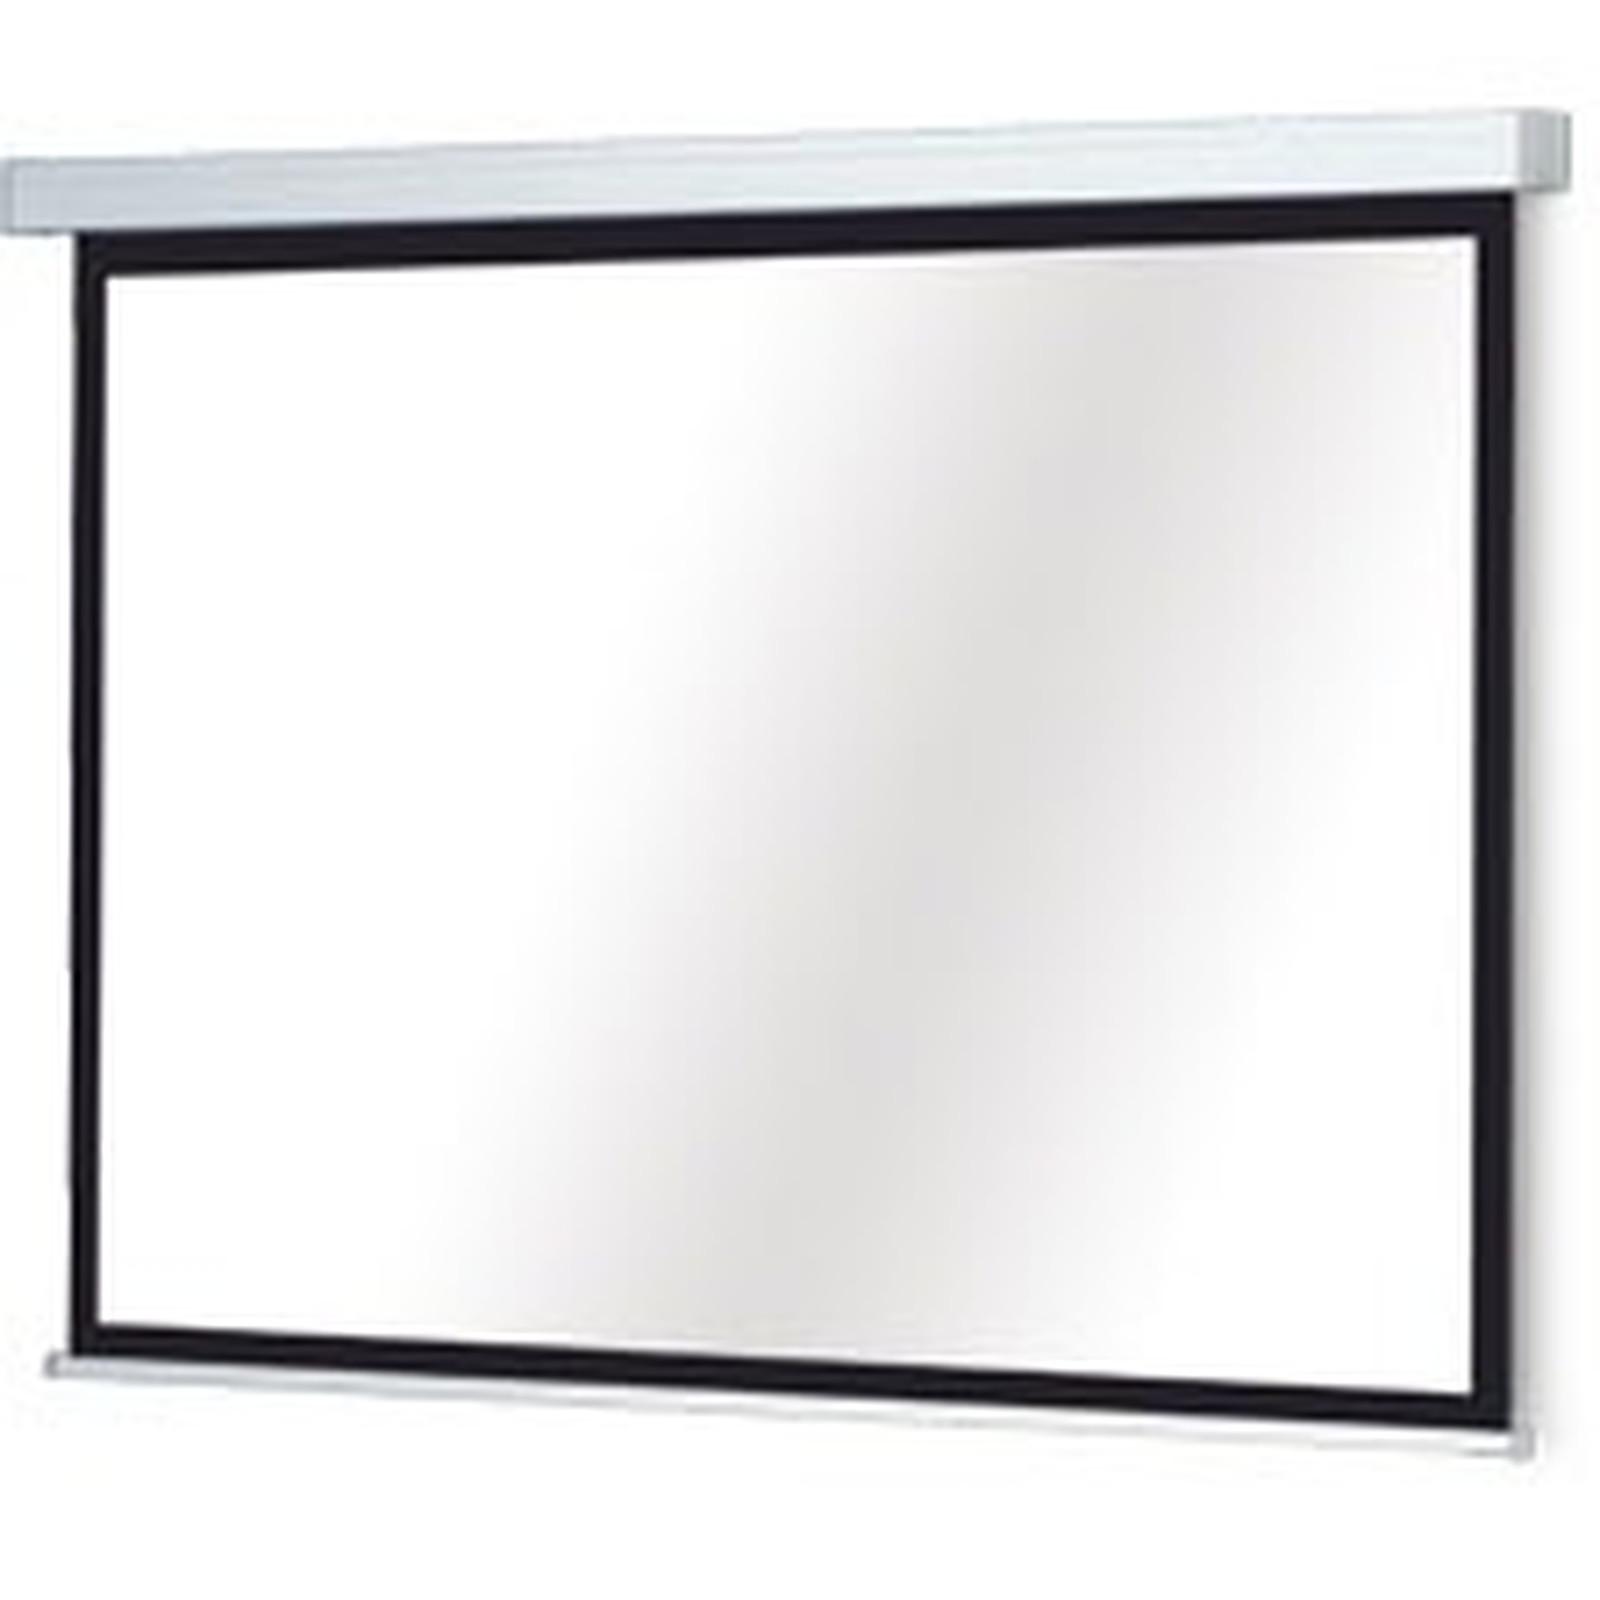 Procolor EASY-SCREEN - Ecran manuel - Format 16:9 - 198x180 cm